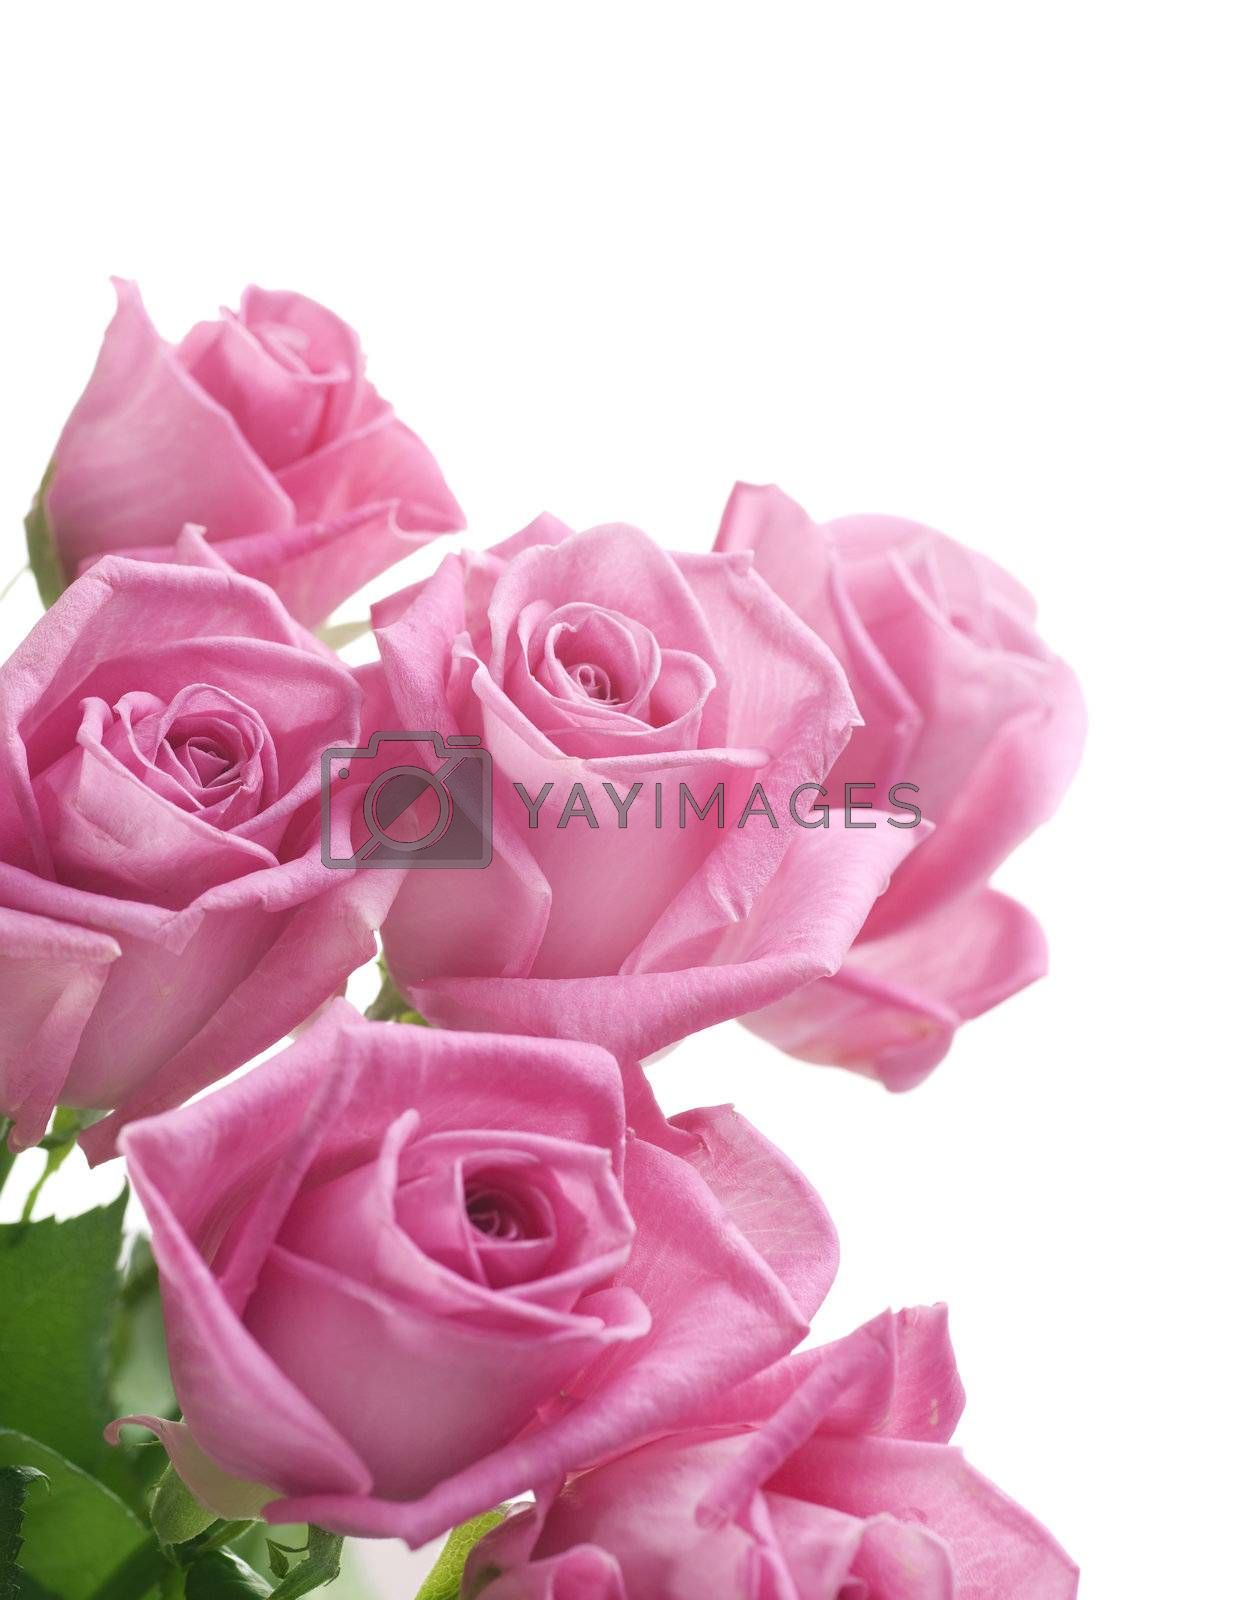 Roses border by Subbotina Anna